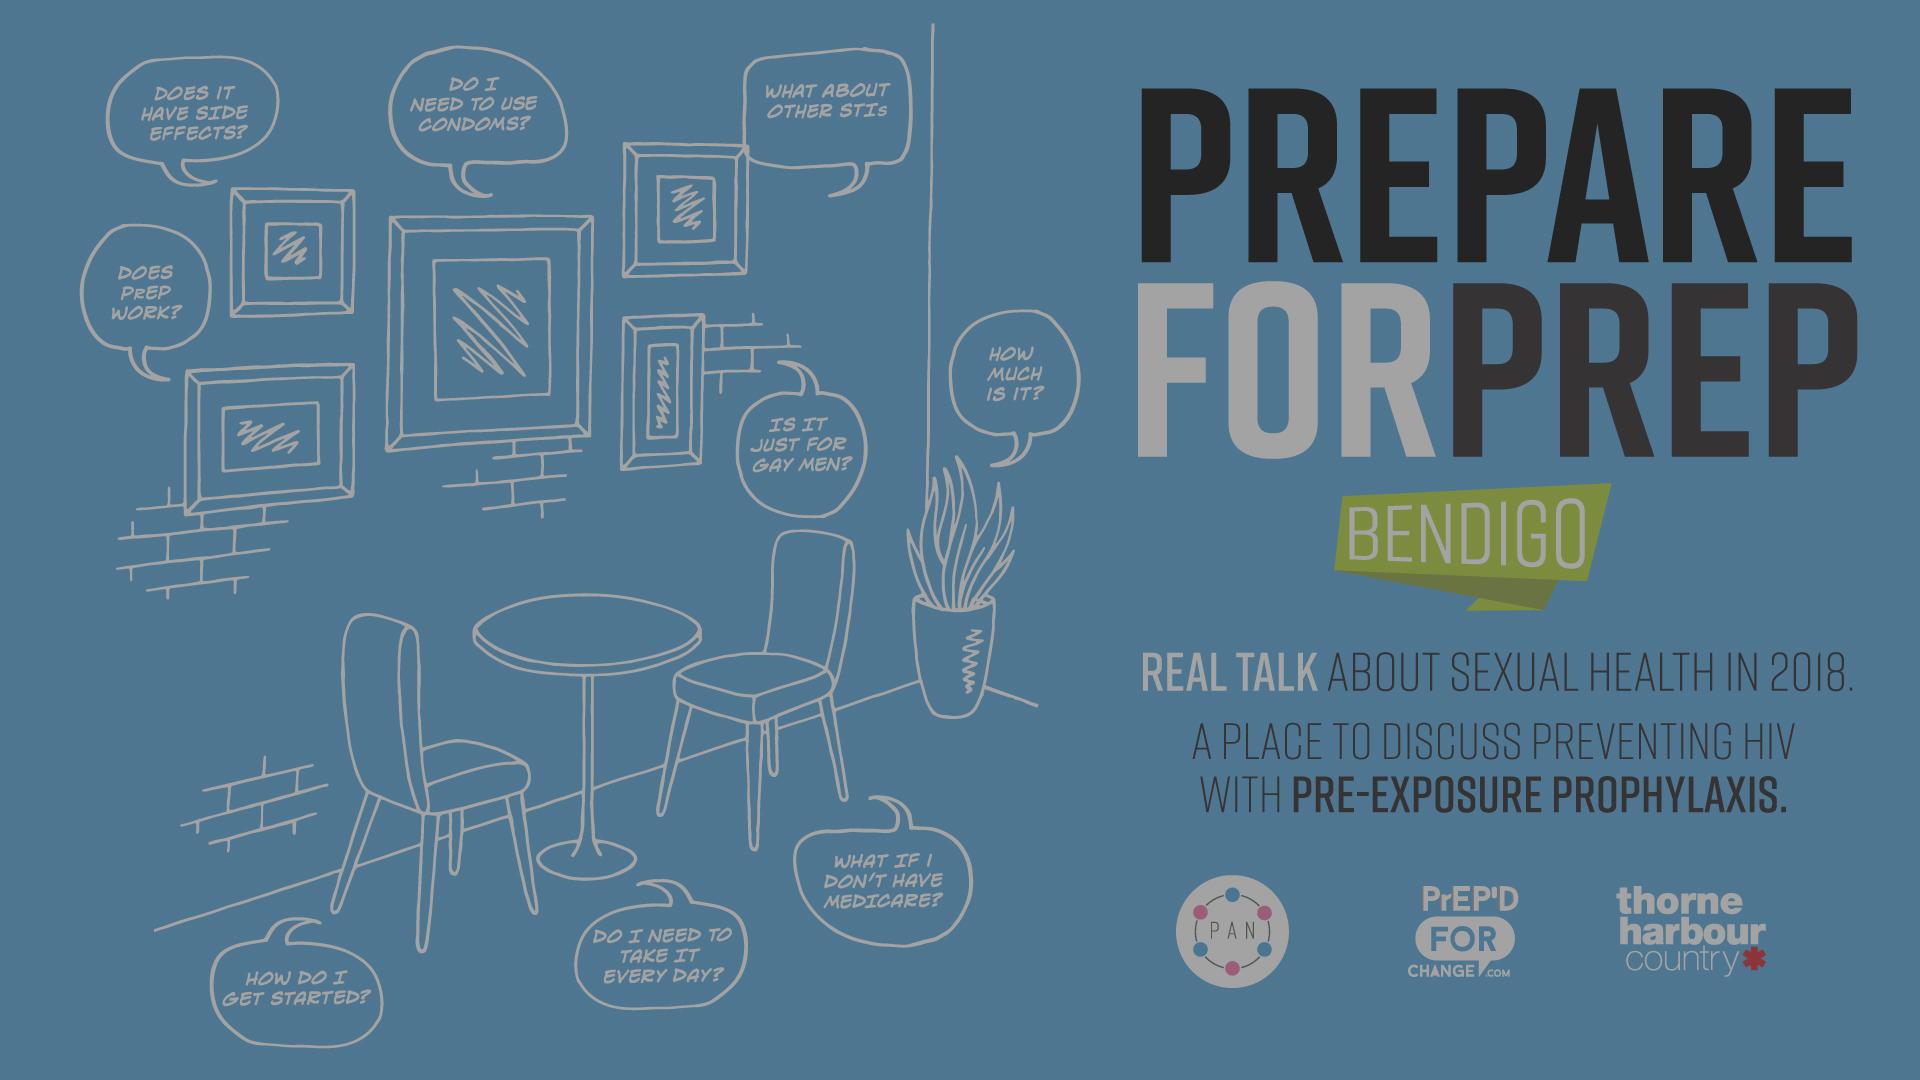 bendigo-prepare-over.png